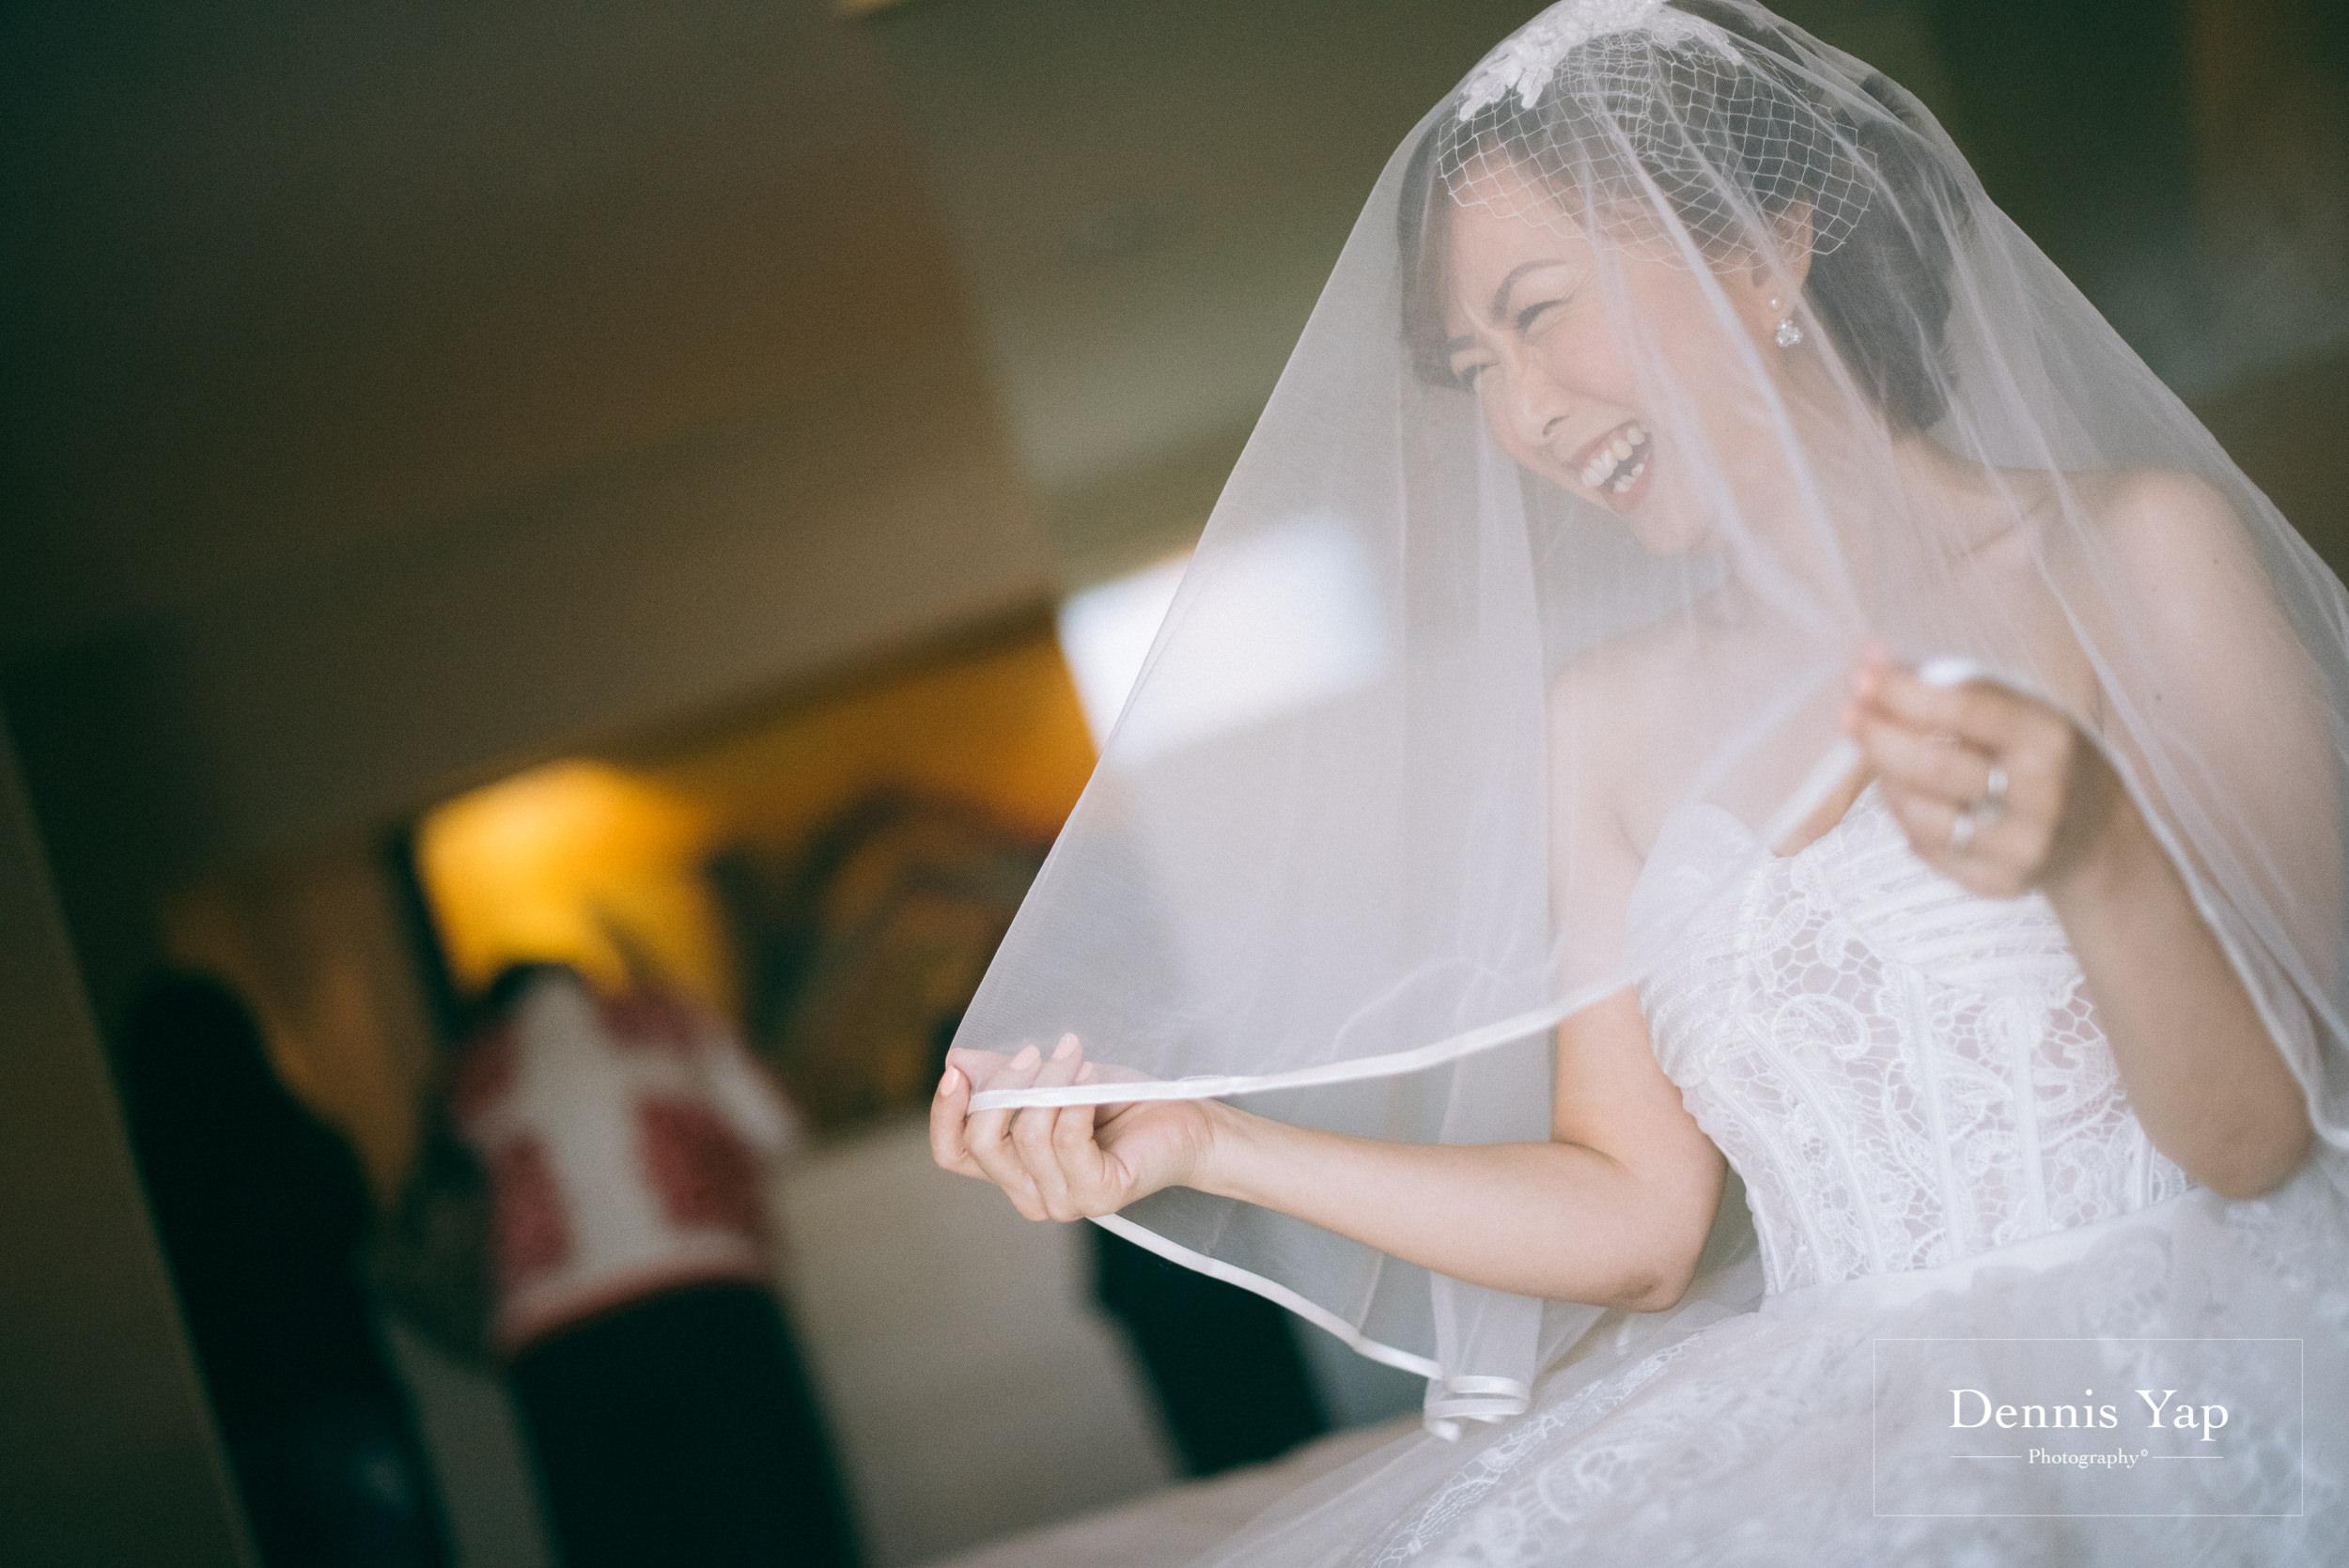 alex eivan wedding day kuala lumpur malaysia dennis yap photography short gown-8.jpg